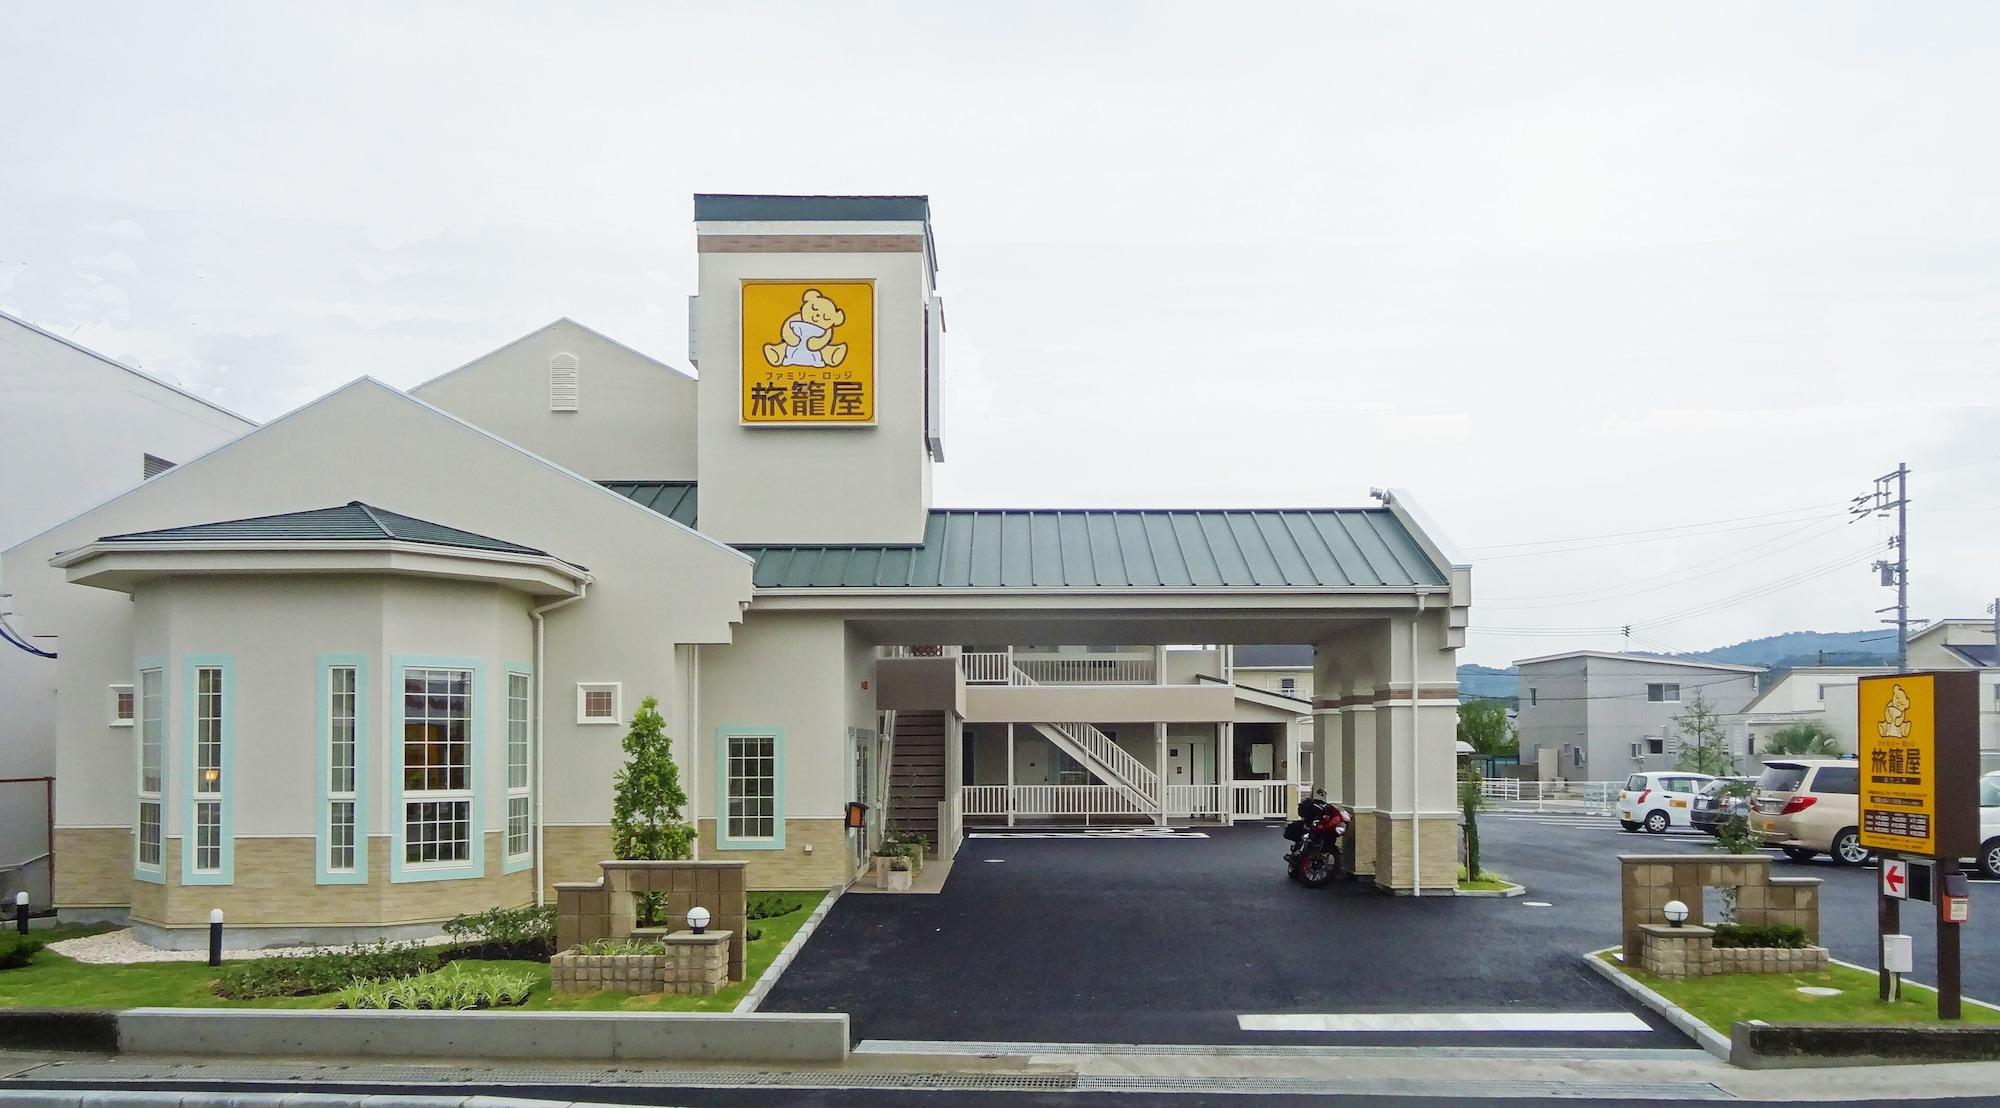 Family Lodge Hatagoya Okayama, Okayama